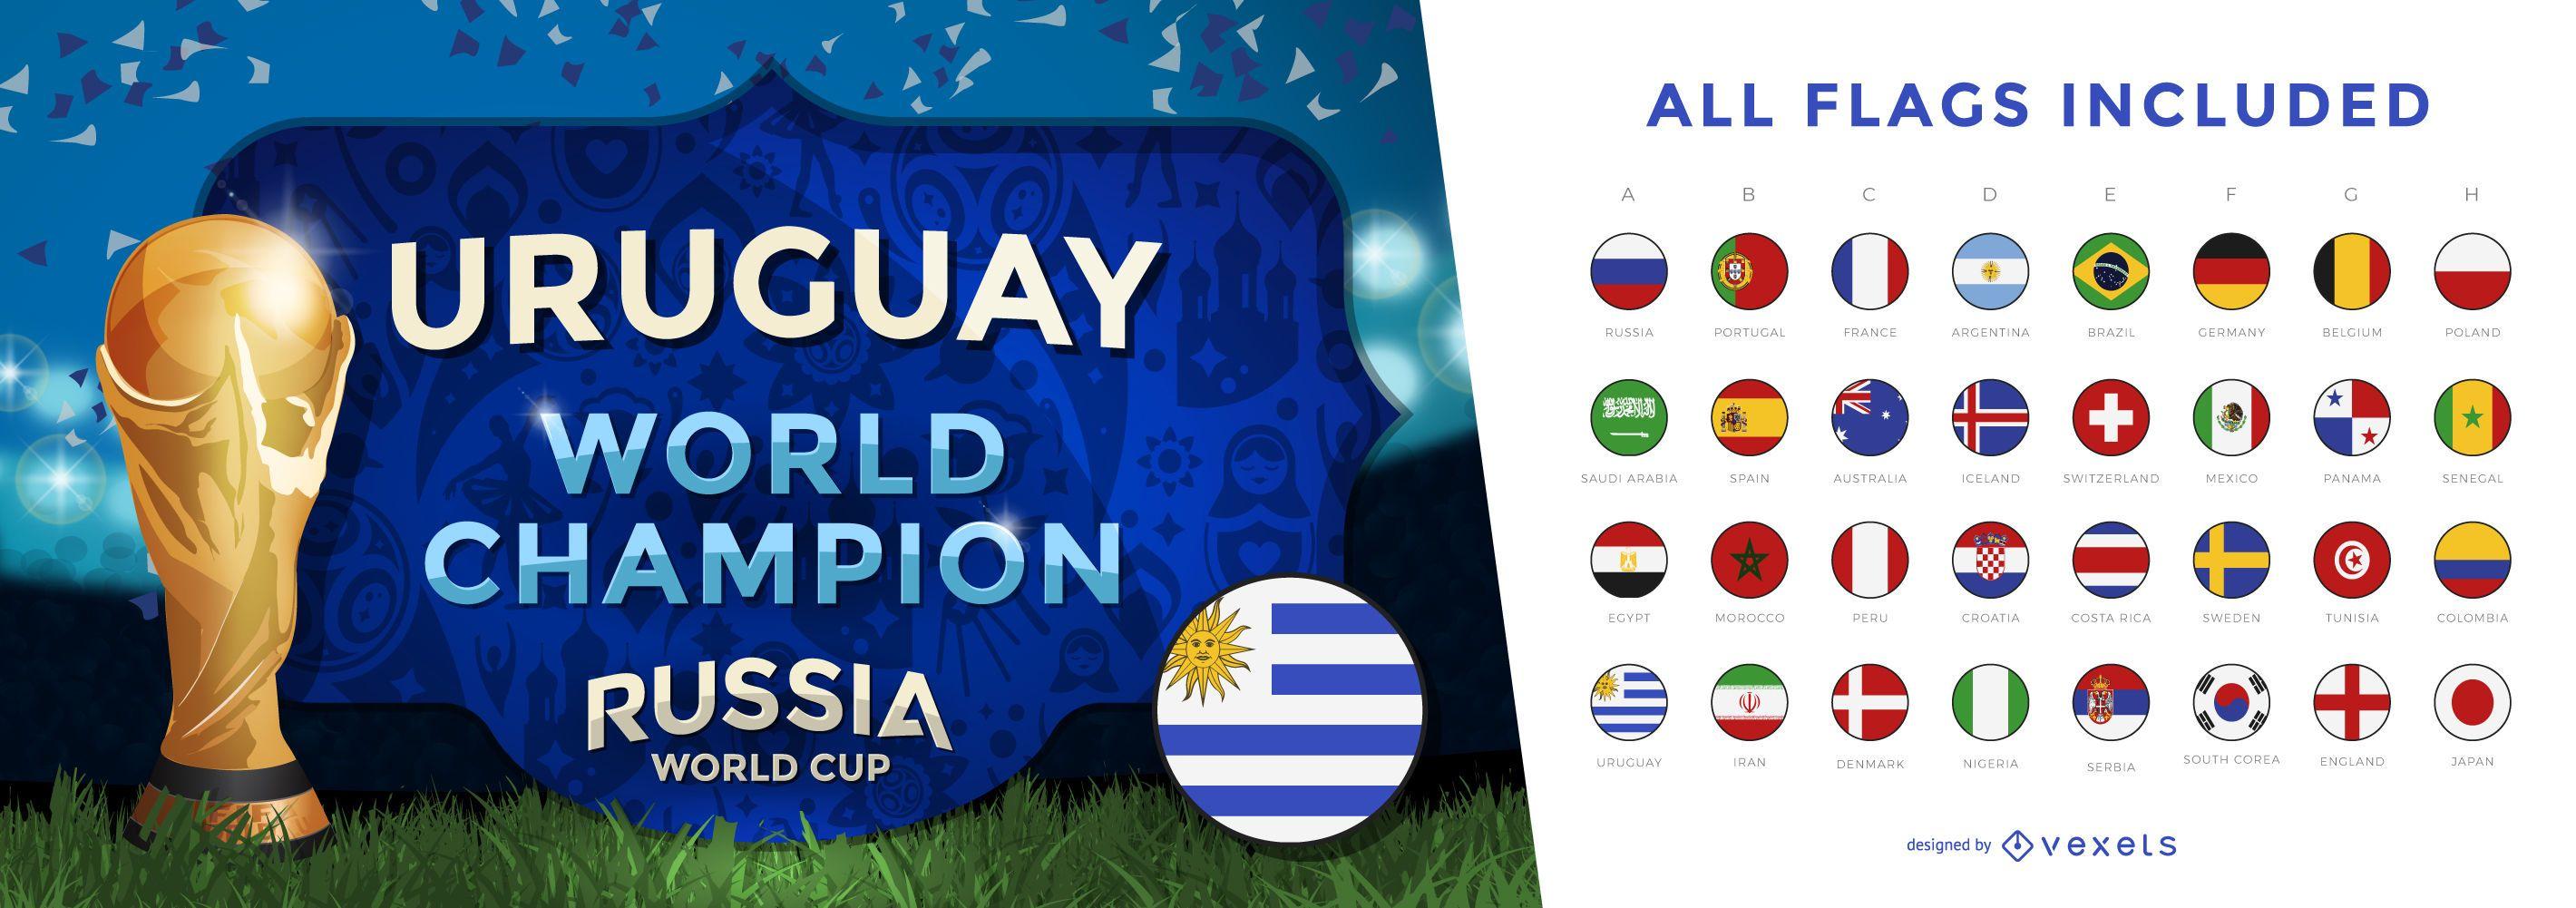 World cup champion banner